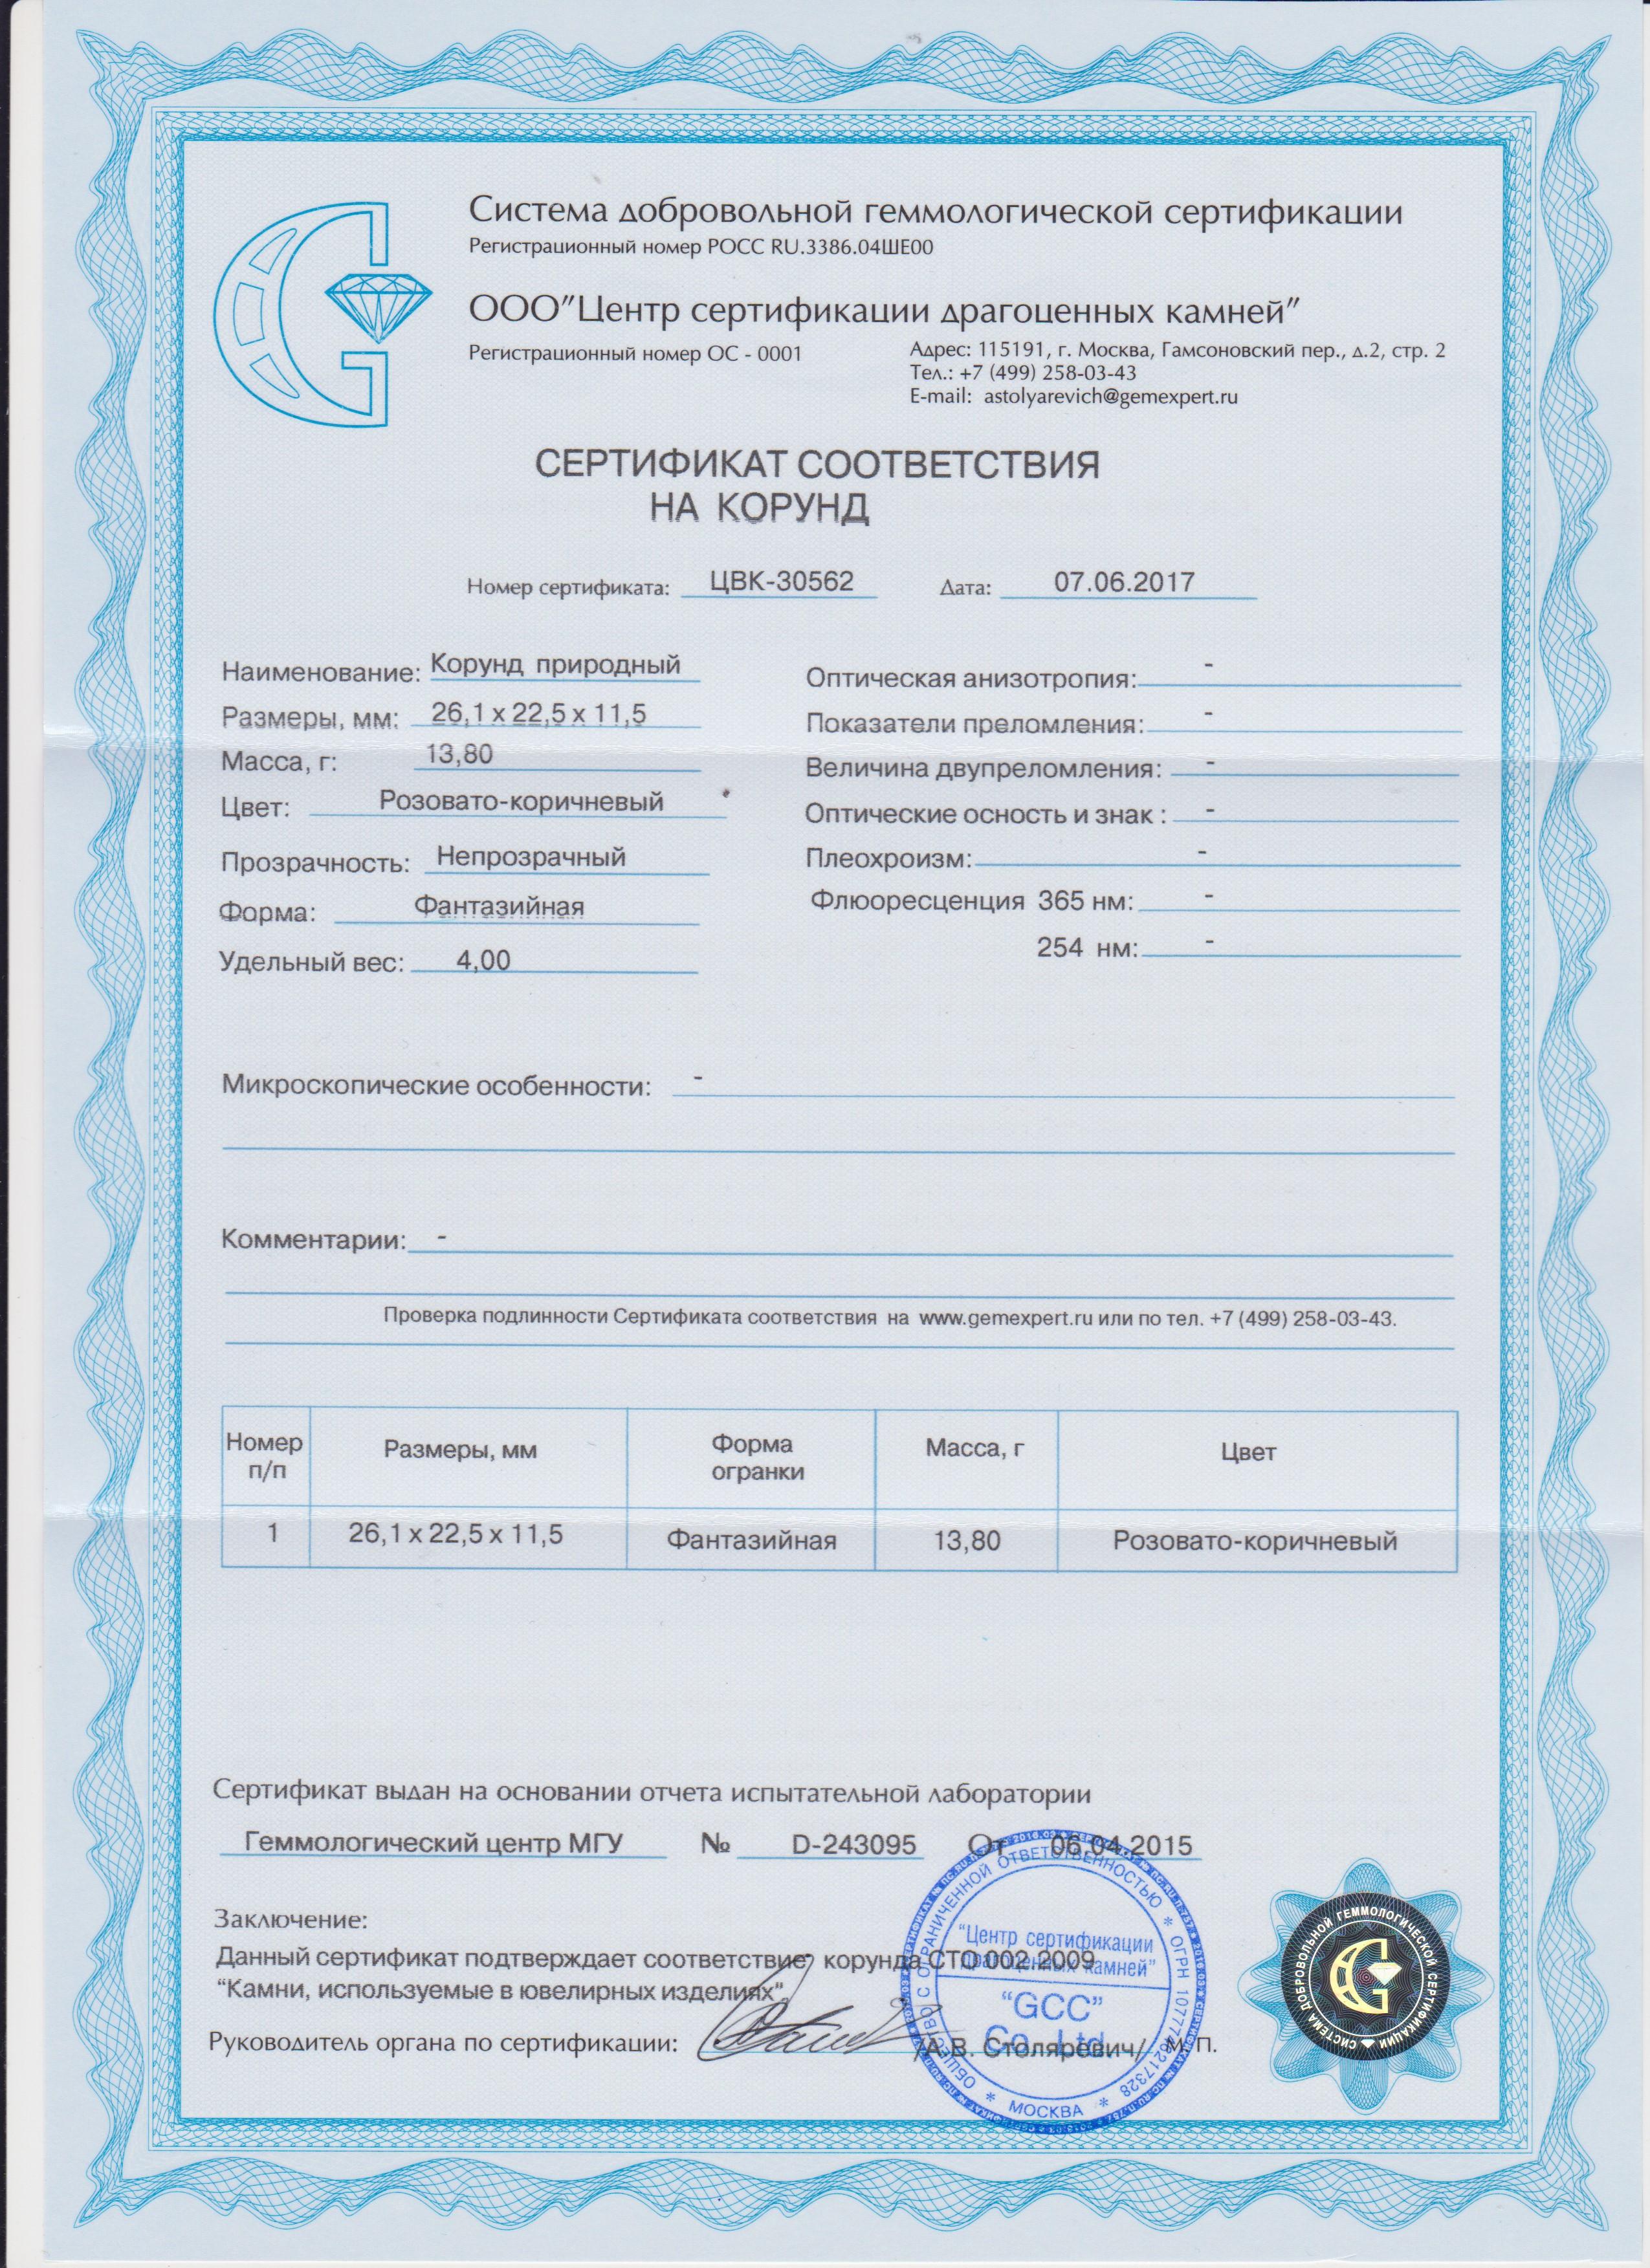 https://mineralmarket.ru/img/certificate/337/1497884591.jpg